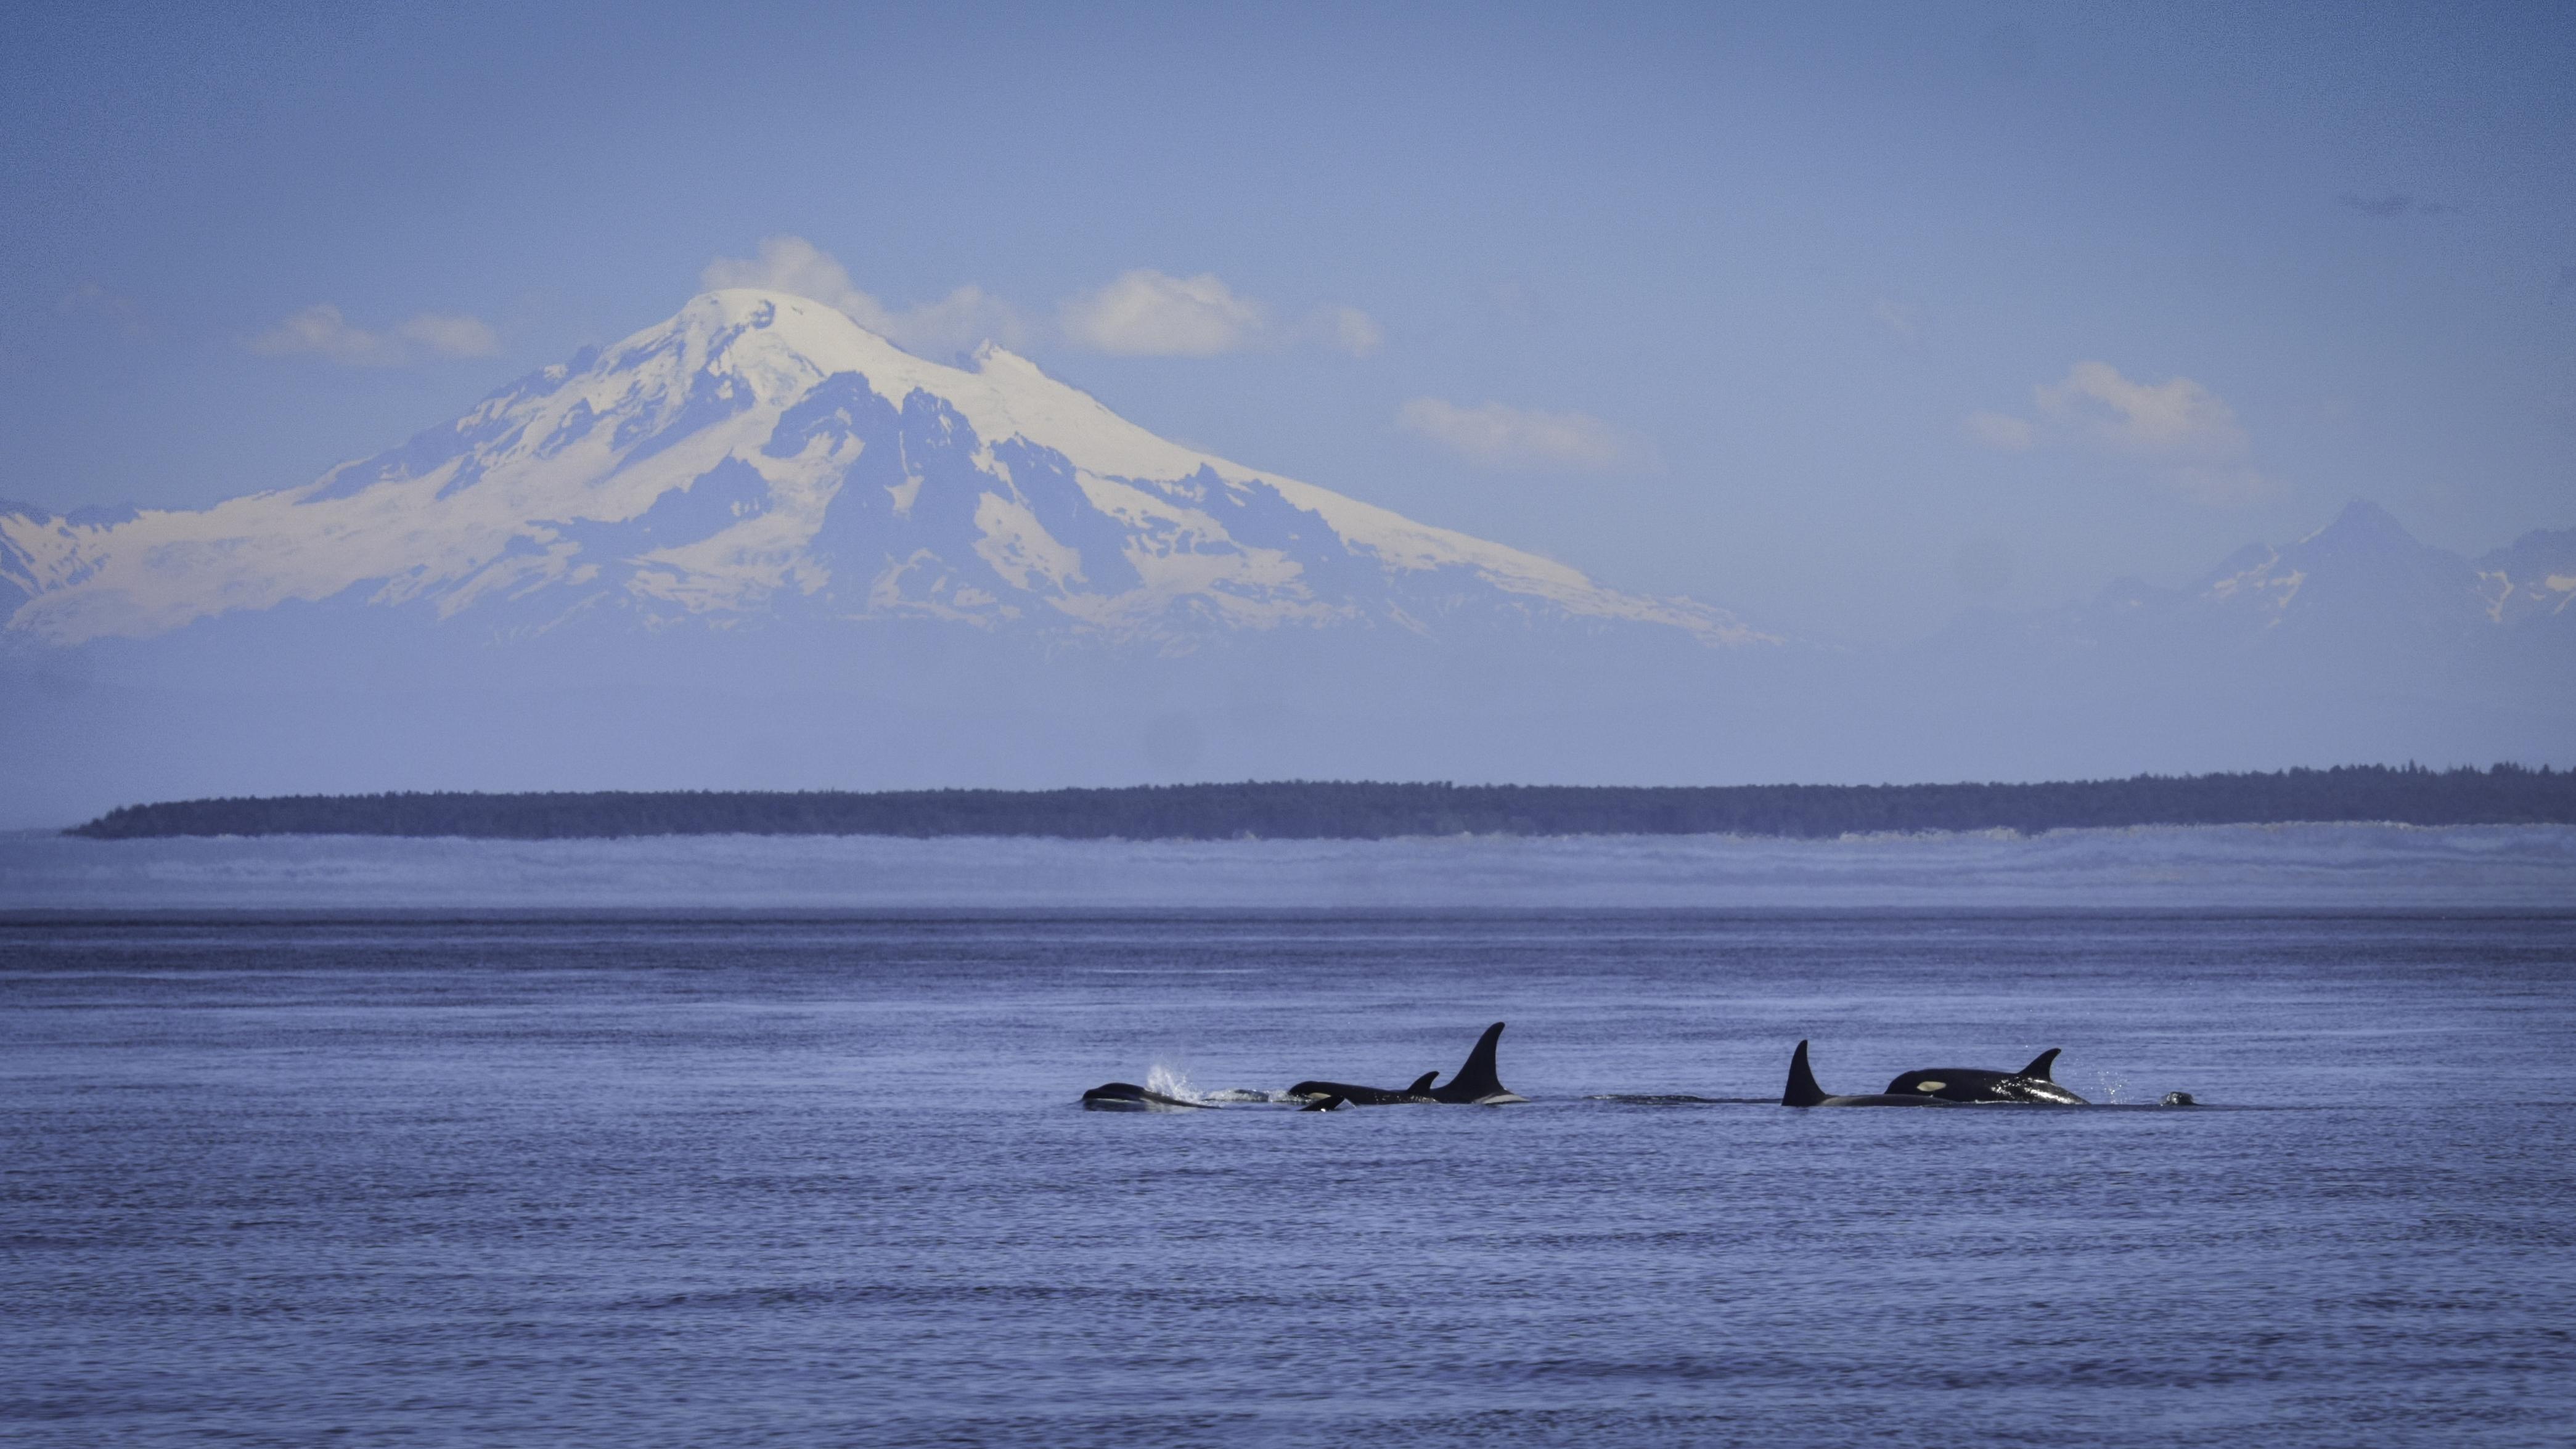 new images show healthy active pnw killer whale calves king5 com